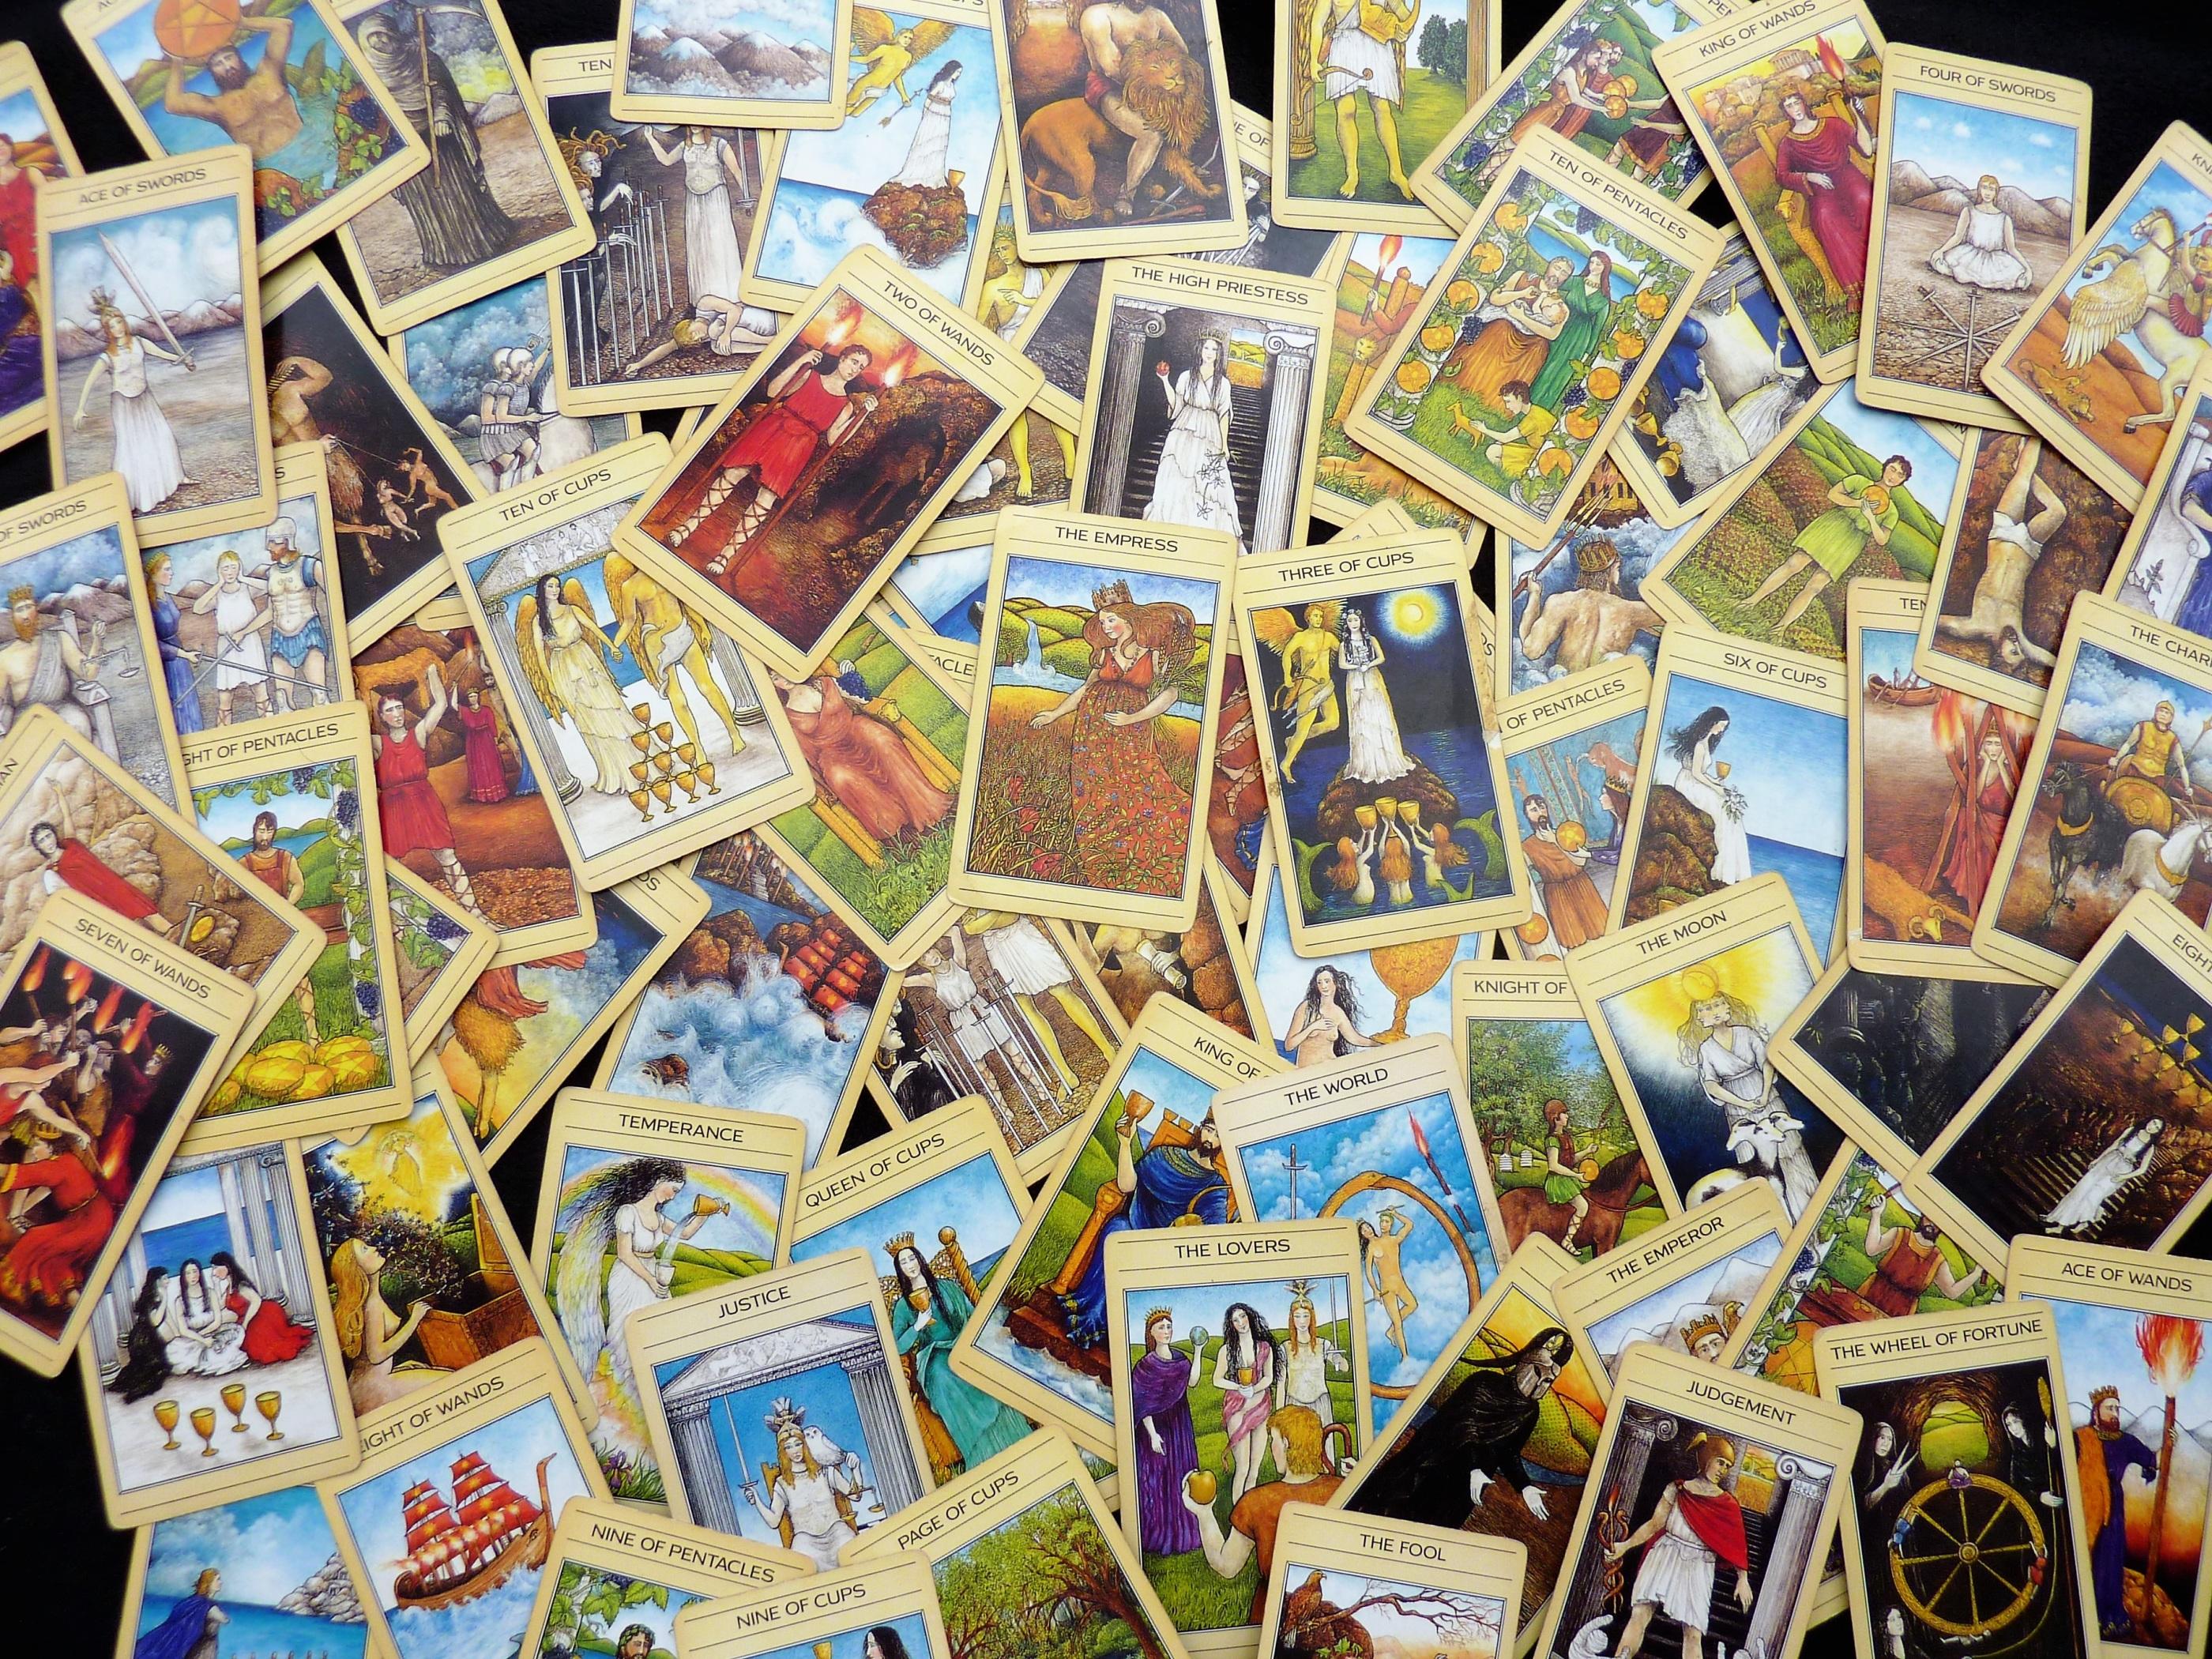 New-Mythic-Tarot-cards